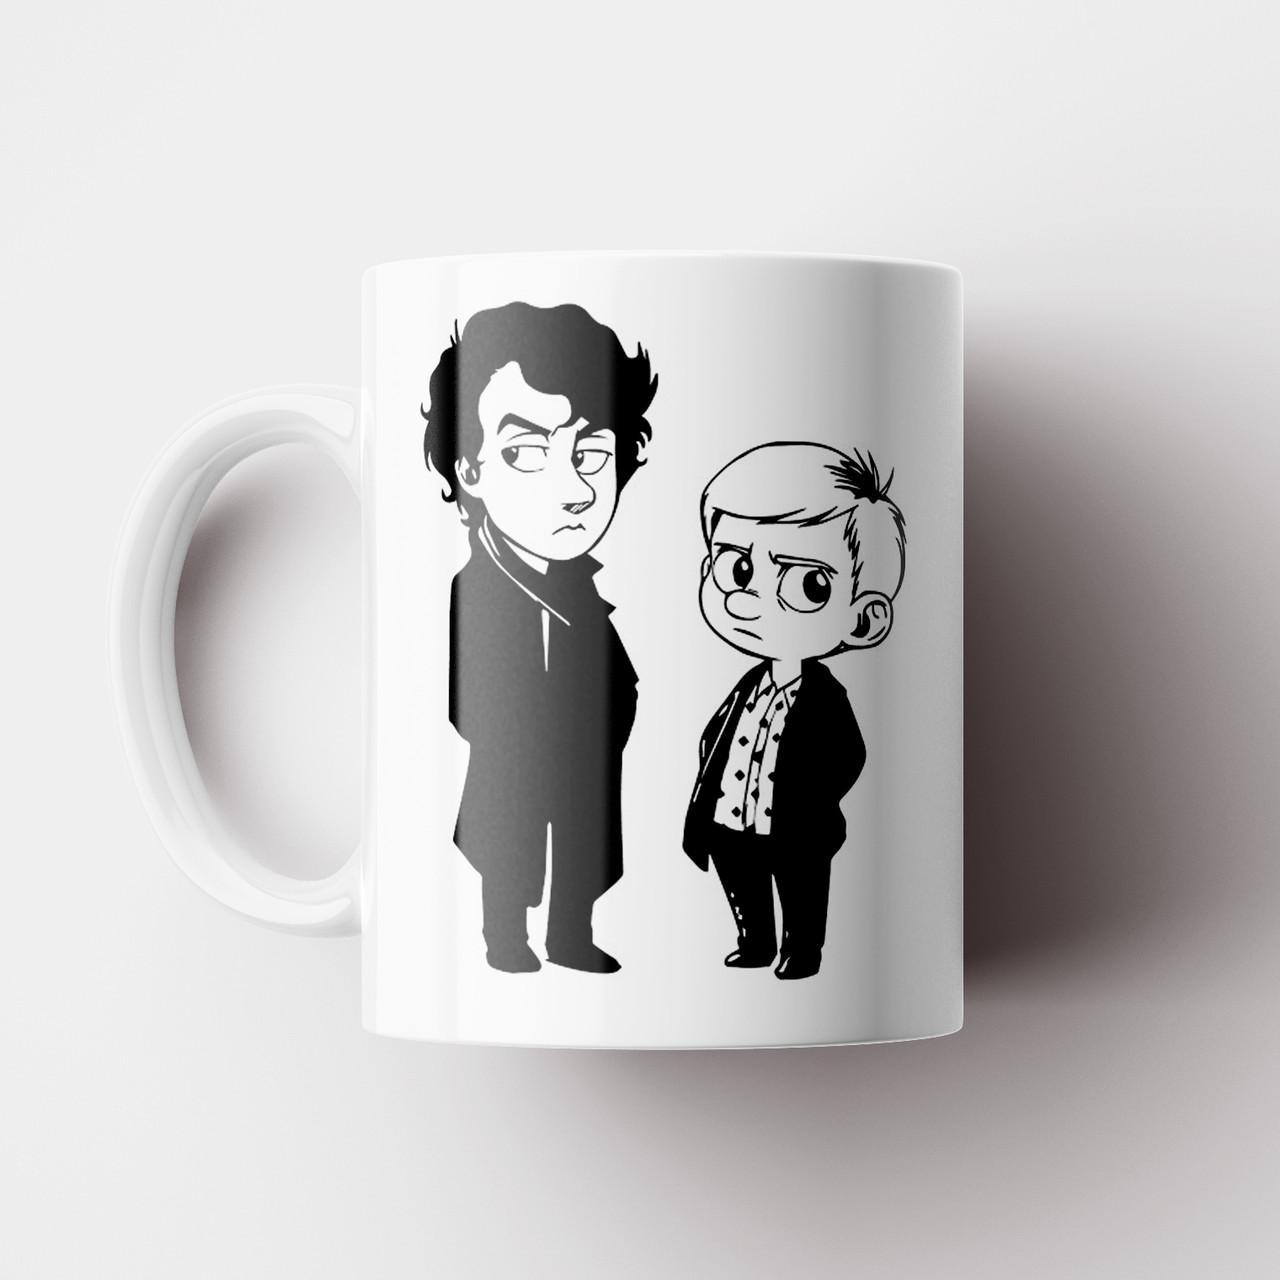 Чашка Шерлок. Sherlock. Кружка с принтом сериал Шерлок. Бенедикт Камбербетч